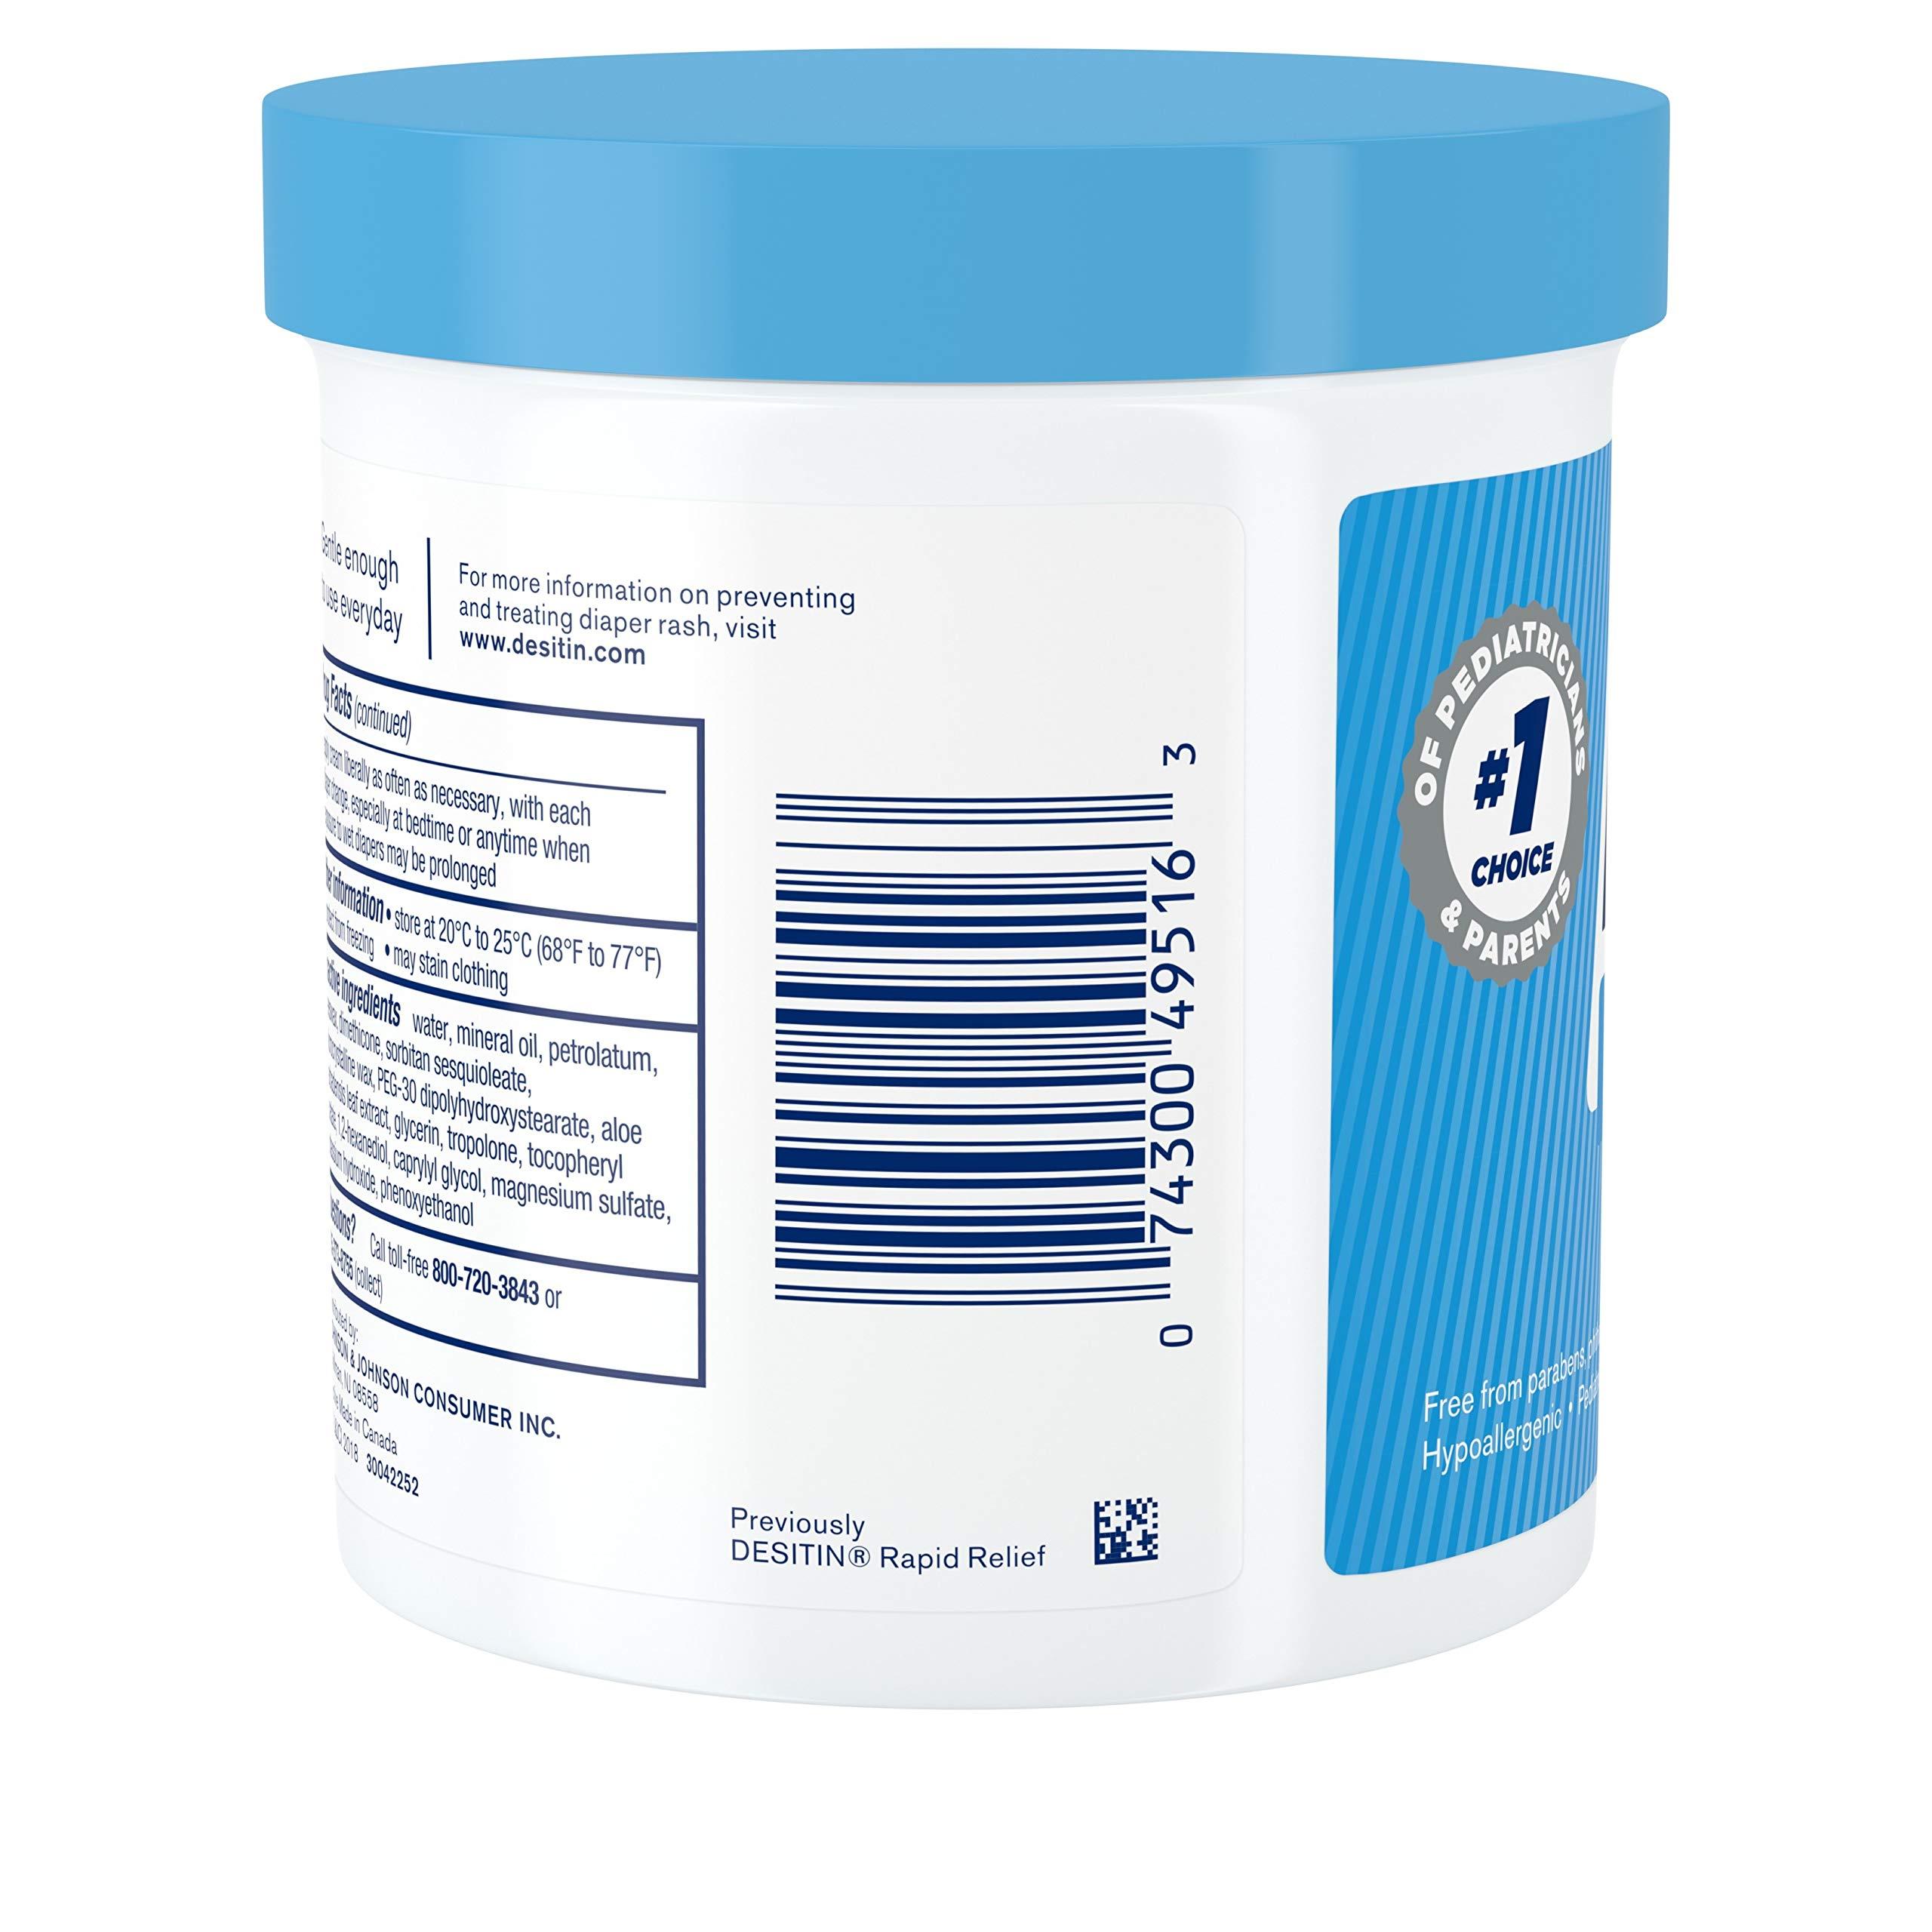 Desitin Daily Defense Baby Diaper Rash Cream with Zinc Oxide to Treat, Relieve & Prevent diaper rash, 16 oz by Desitin (Image #7)